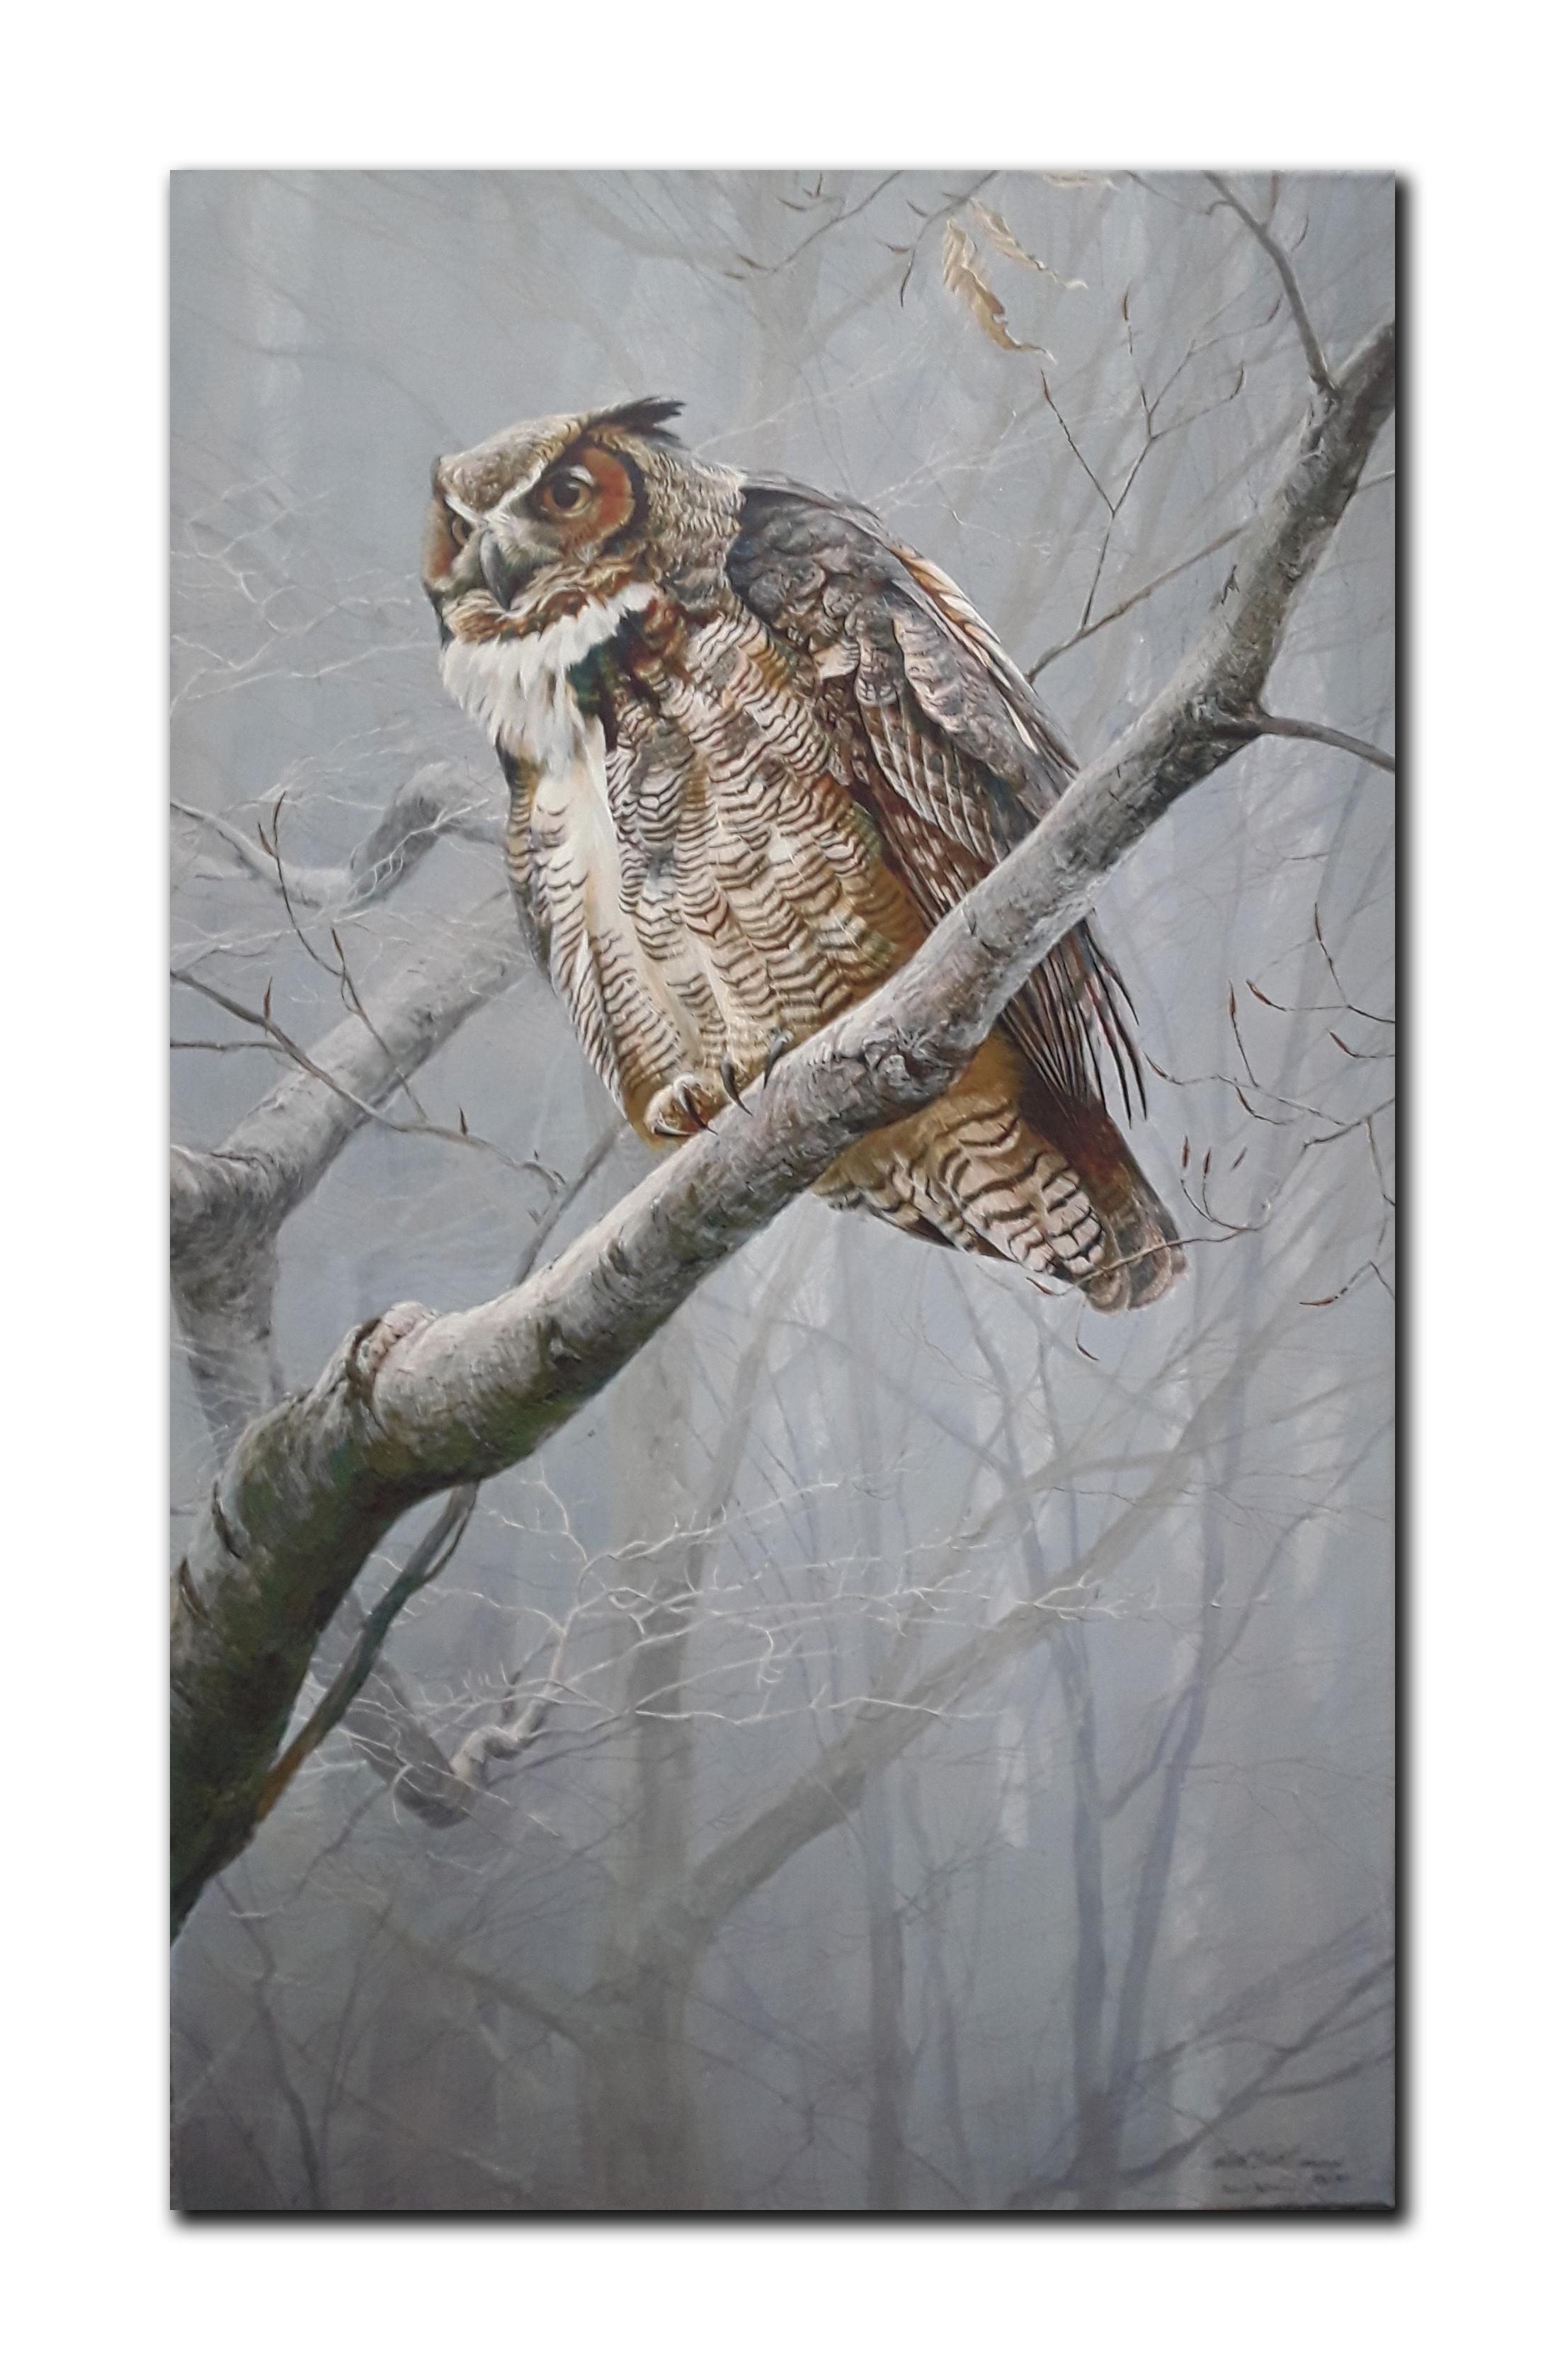 "Robert Bateman's ""Winter Mist- Great Horned Owl"" Limited Edition Canvas"